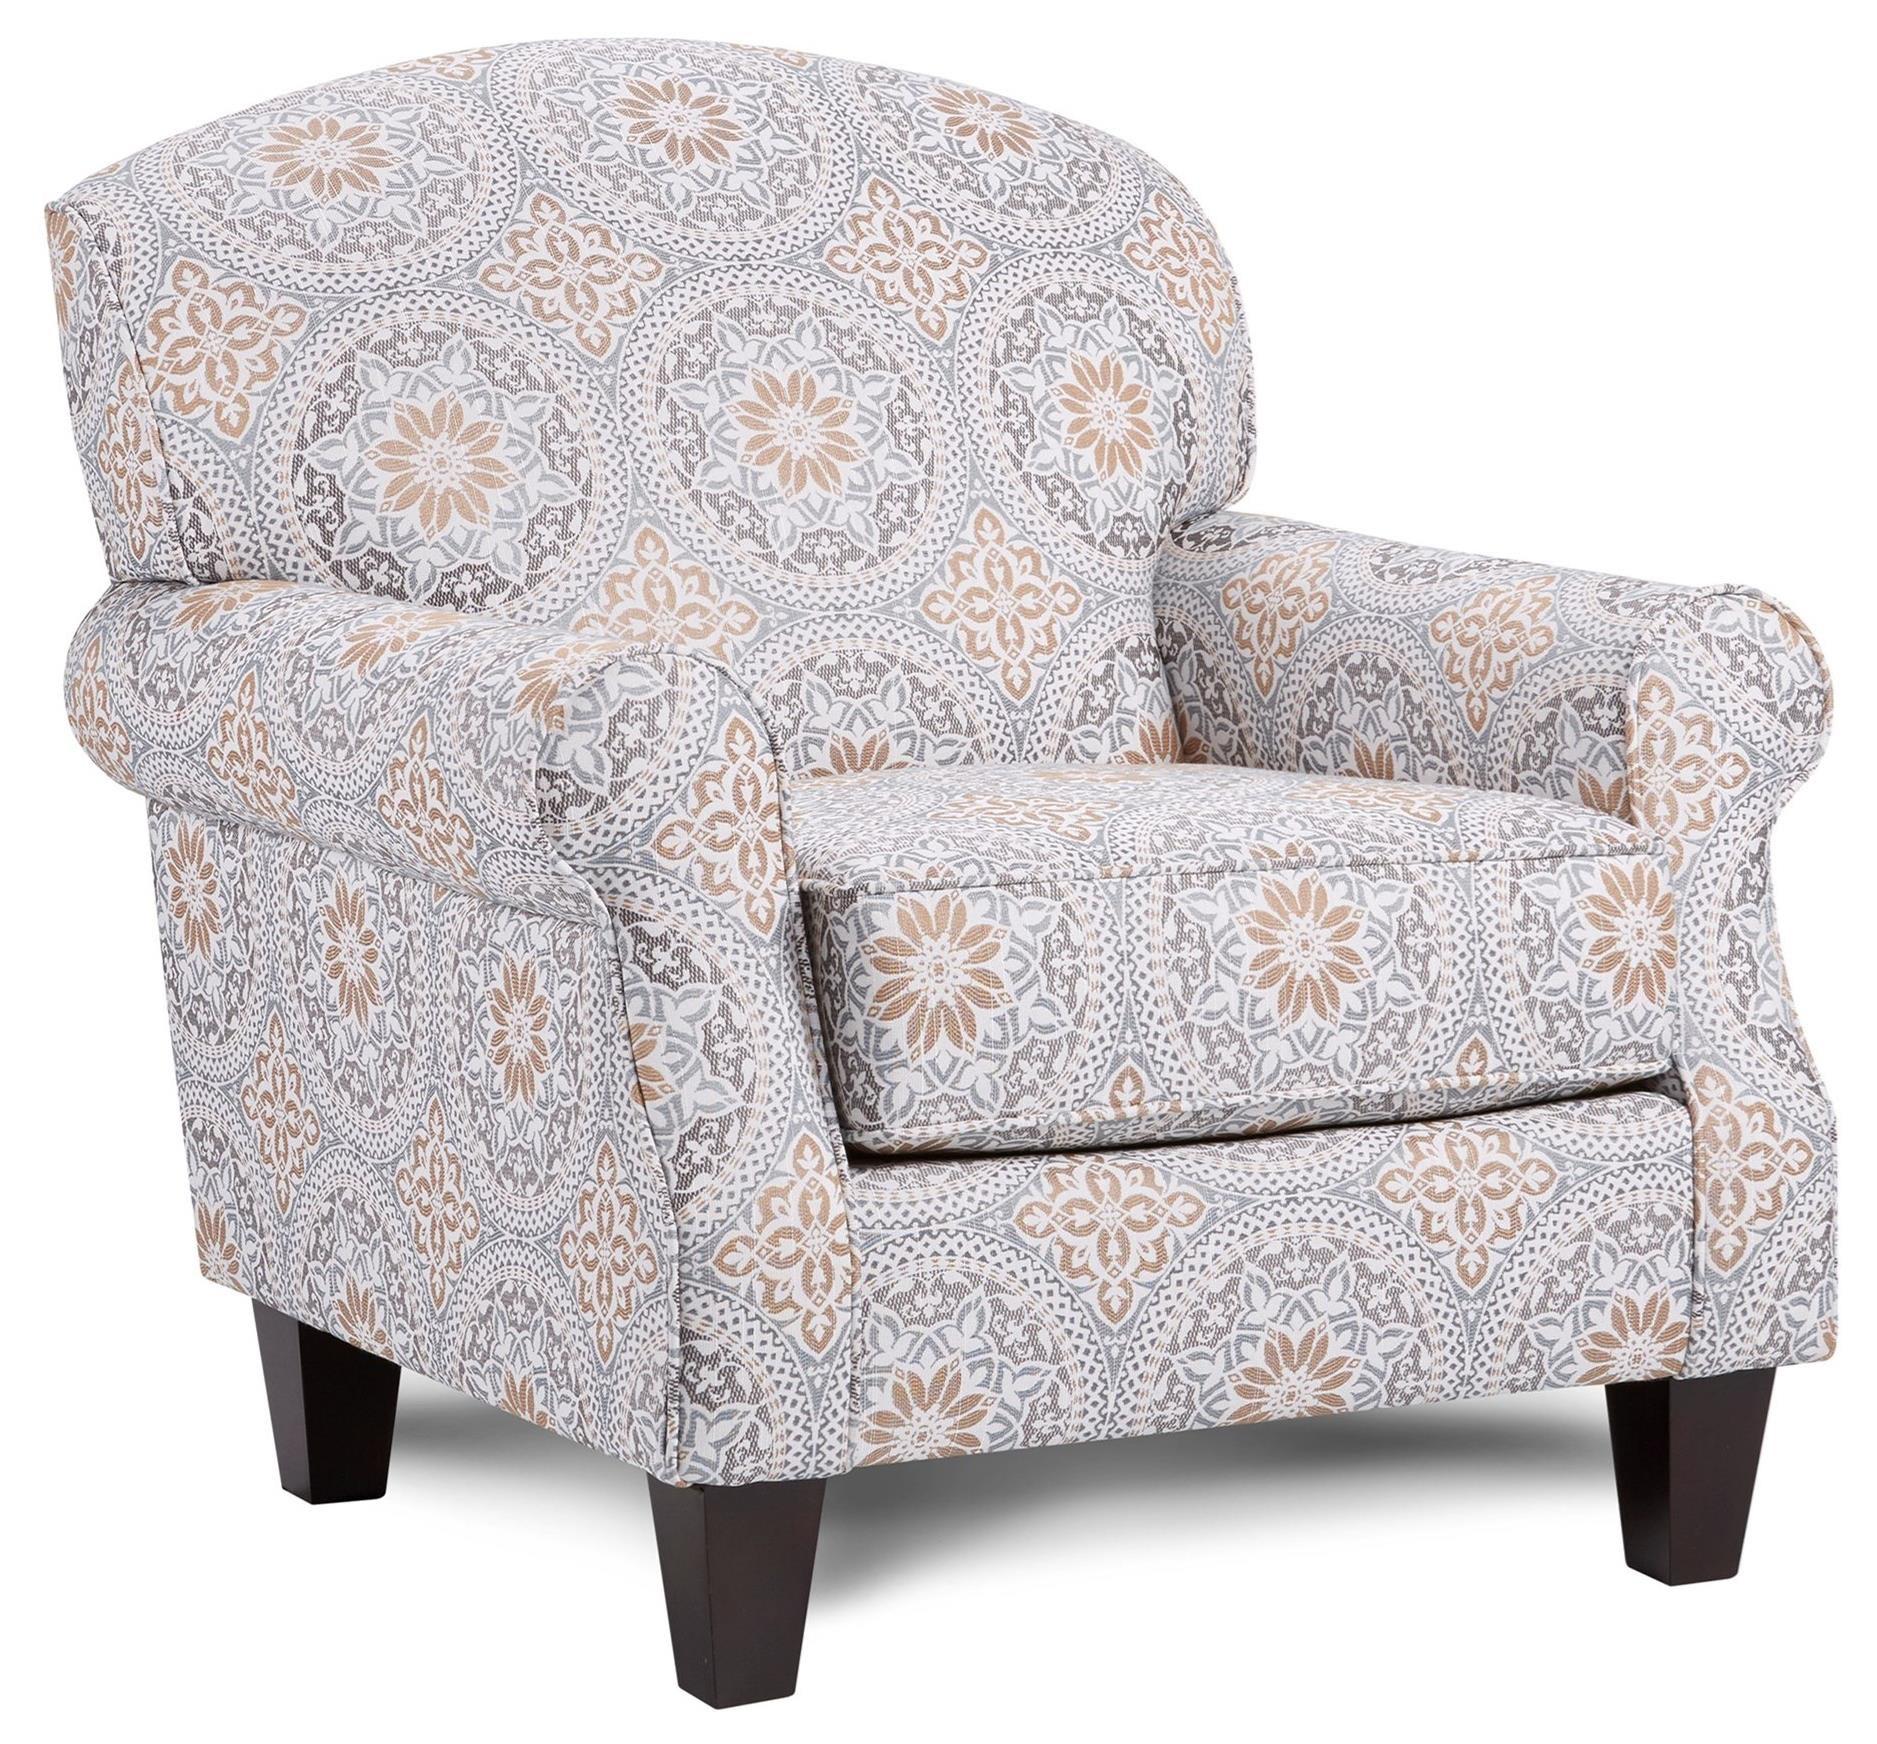 532 Accent Chair by Fusion Furniture at Furniture Fair - North Carolina